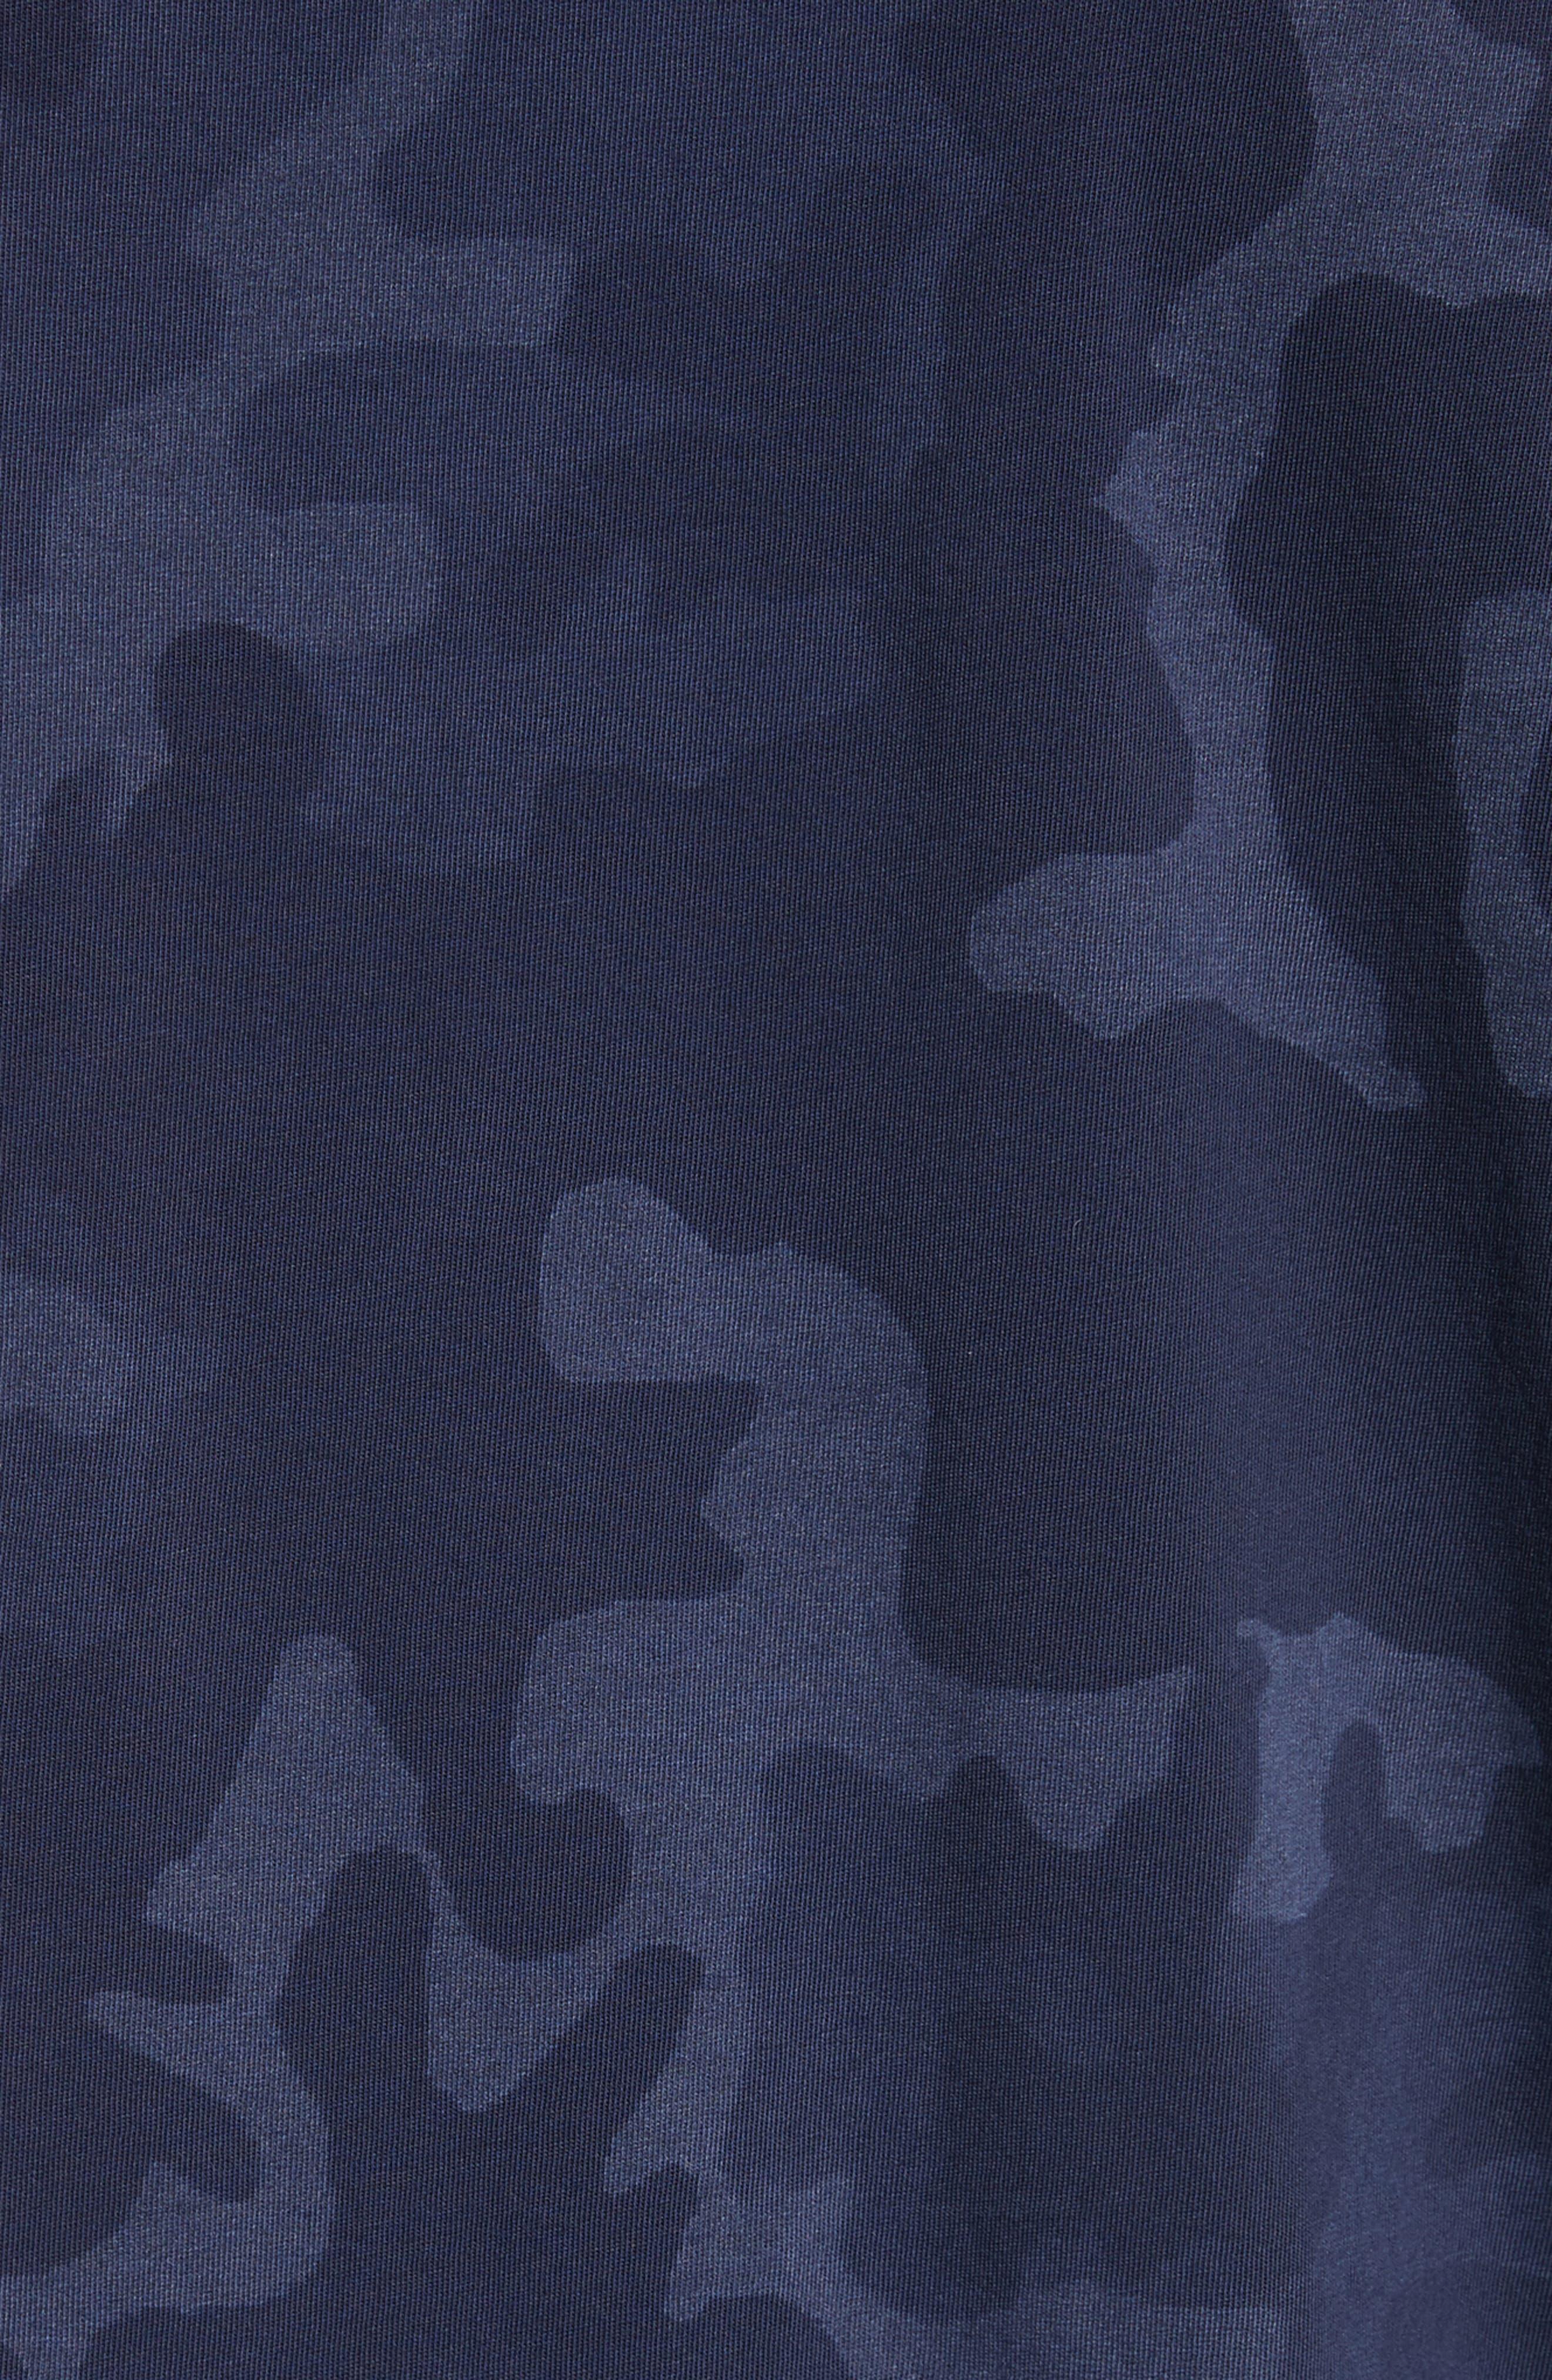 Camo Print Crewneck T-Shirt,                             Alternate thumbnail 5, color,                             Blue Camo